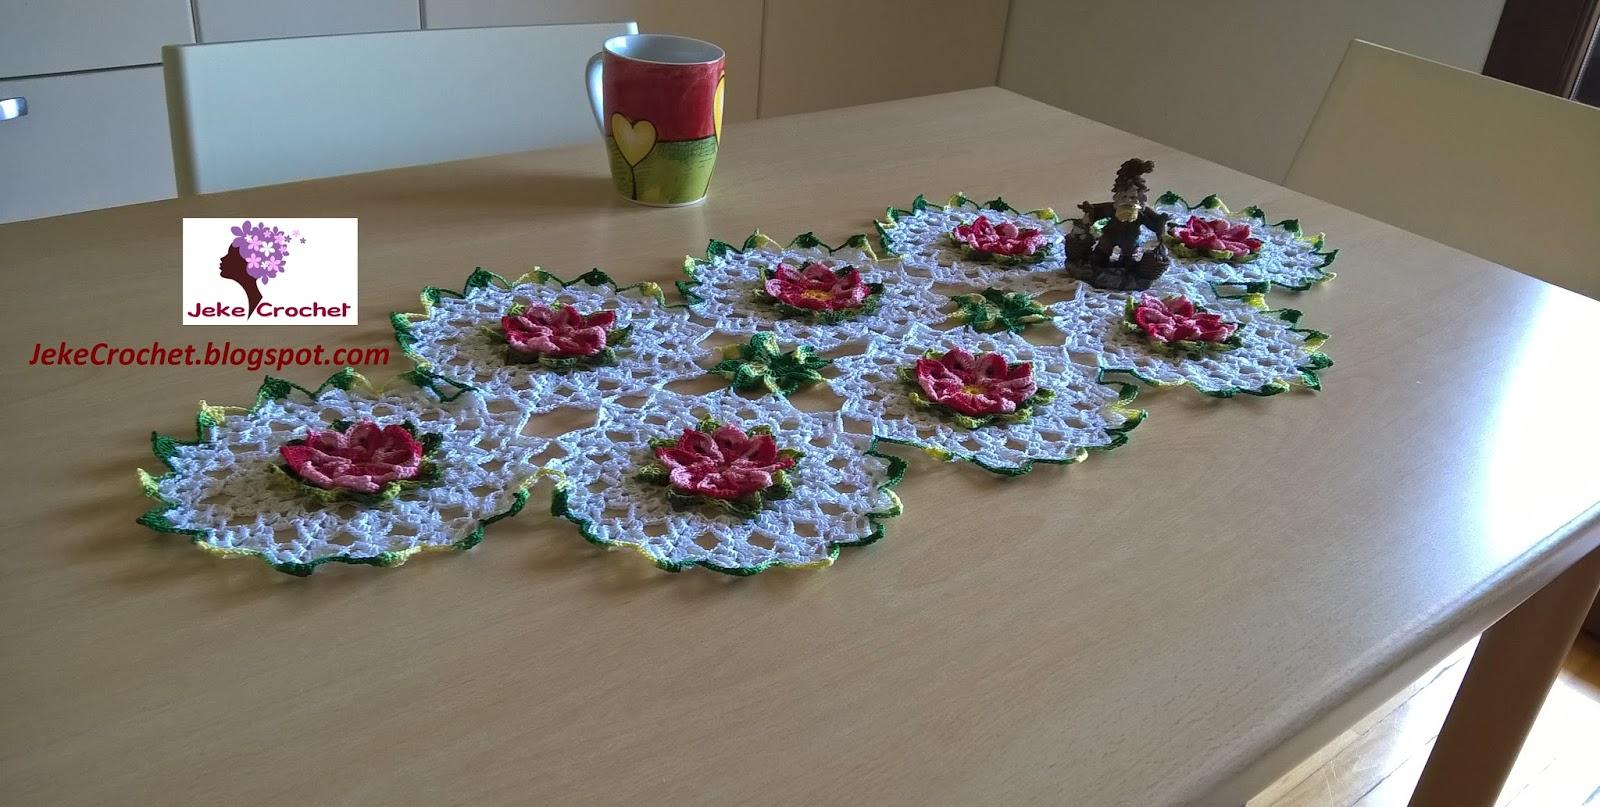 Jeke crochet camino de mesa primaveril a crochet o - Caminos para mesas ...